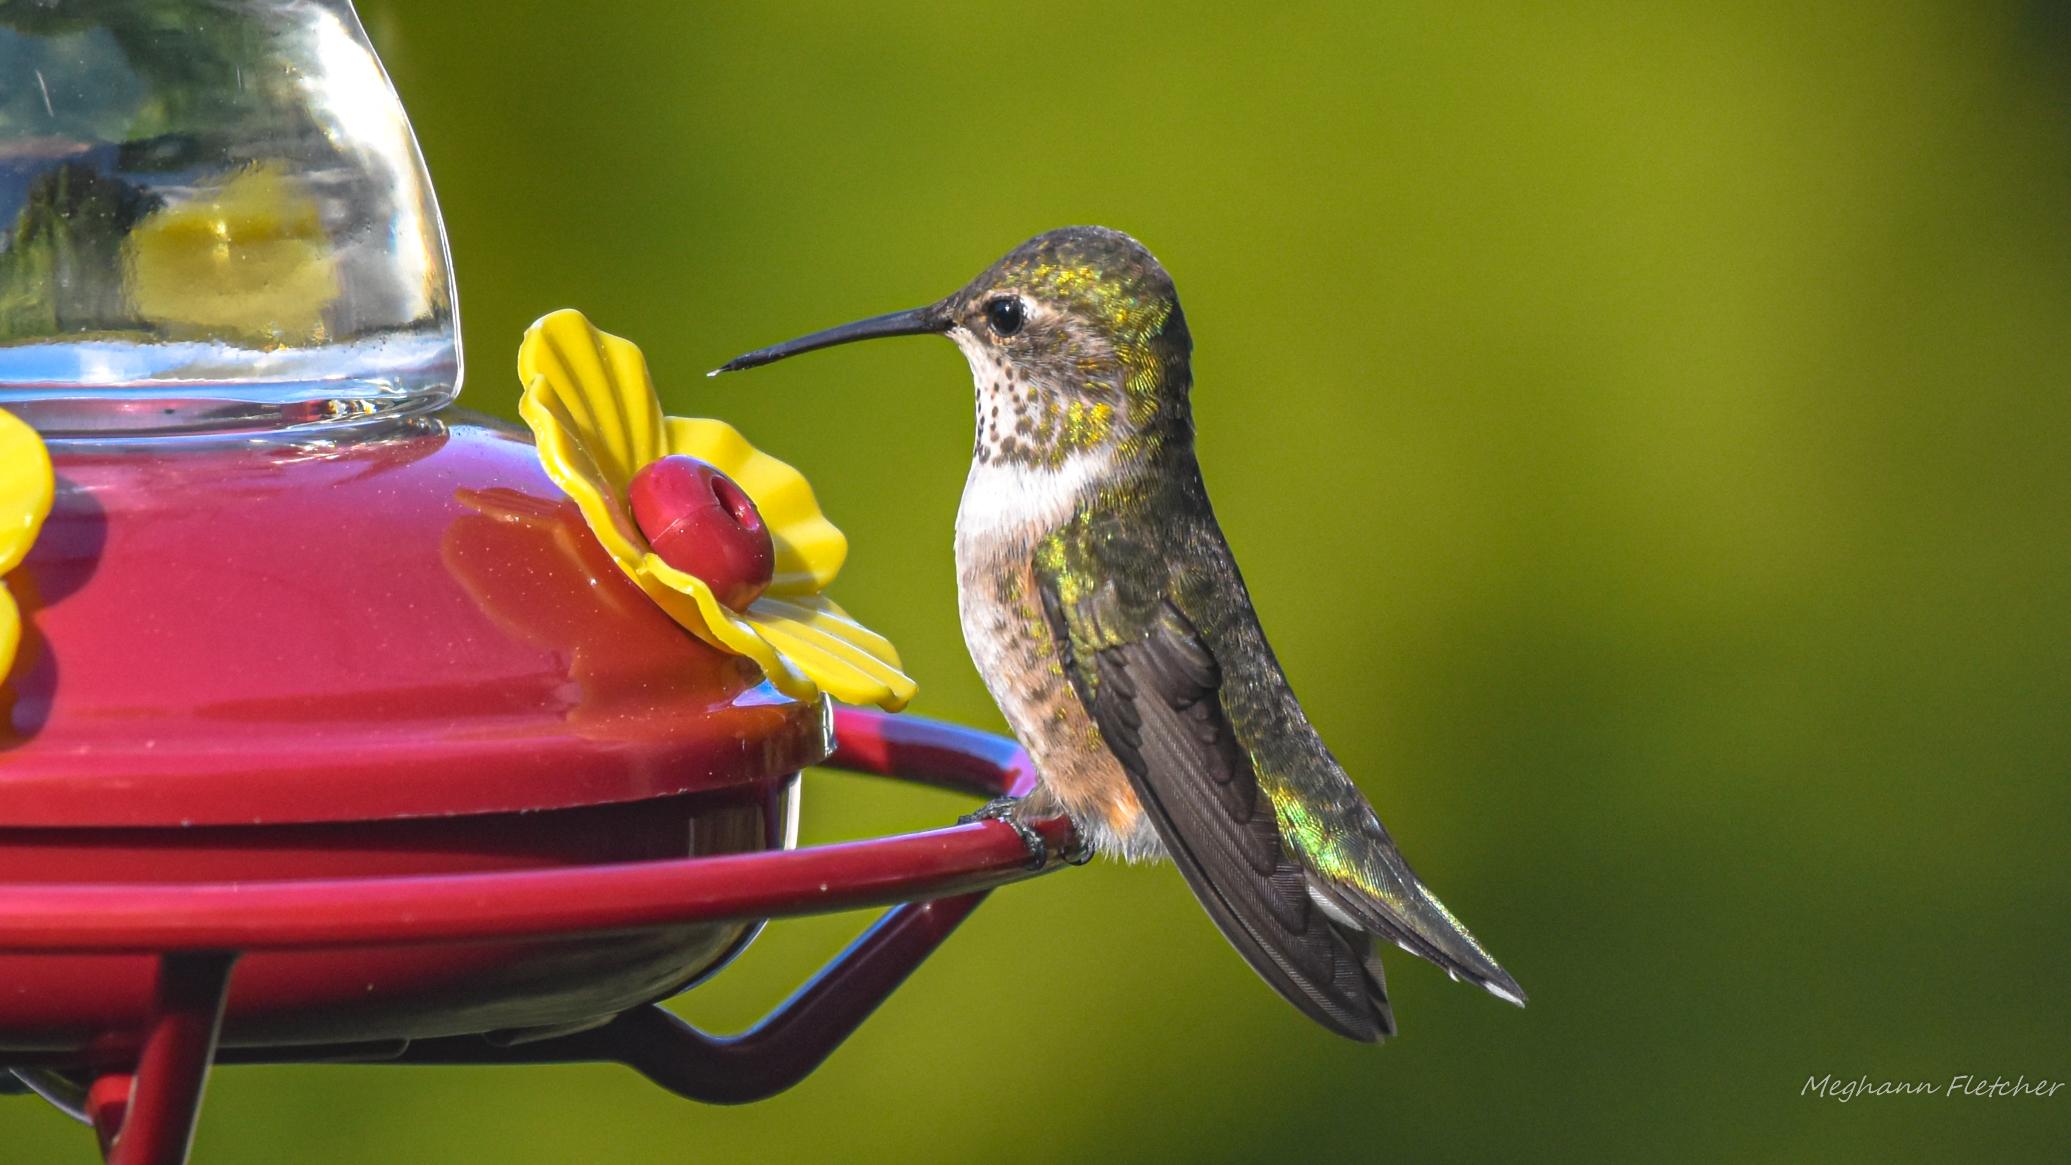 Calliope hummingbird at feeder